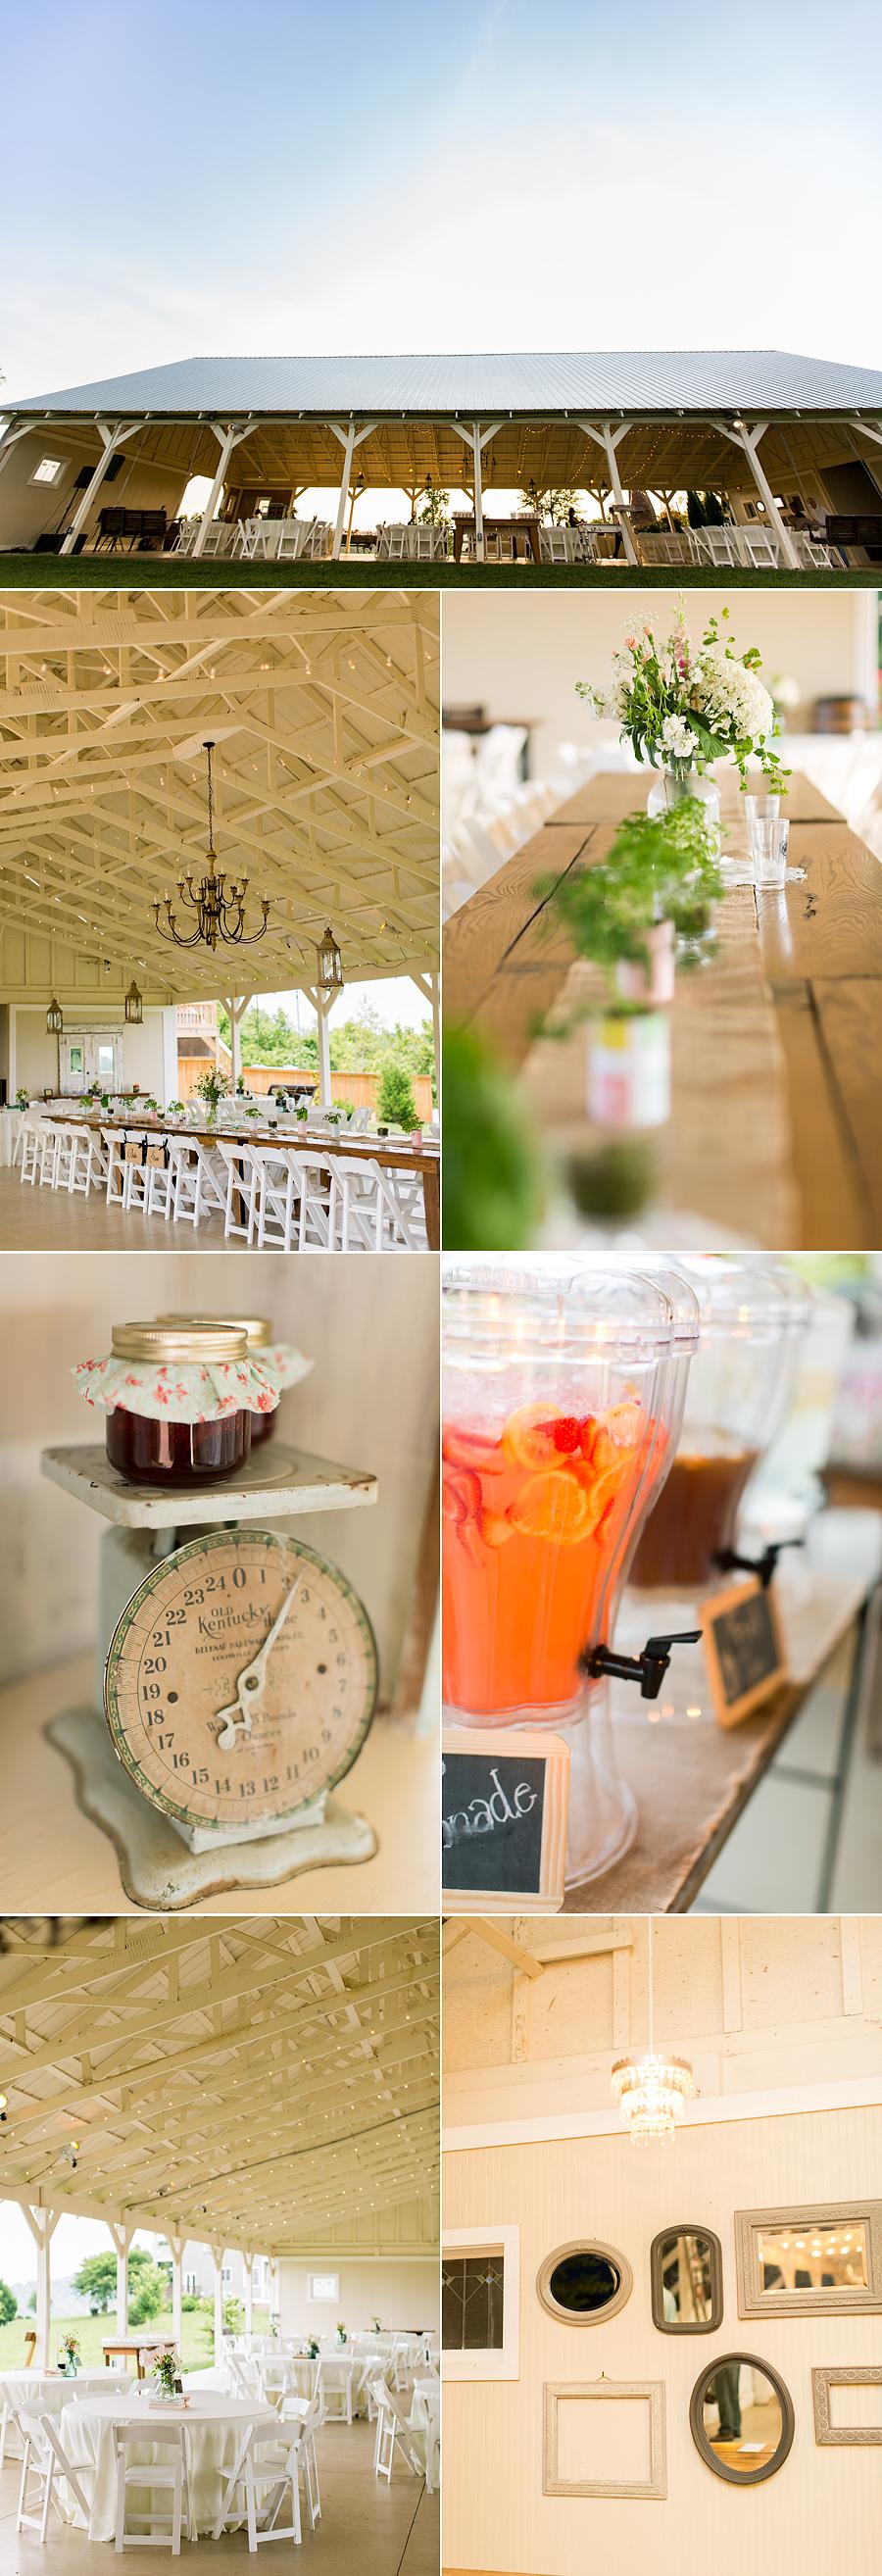 Front_Porch_Farms_Wedding_Photography_Rachel_Moore_8